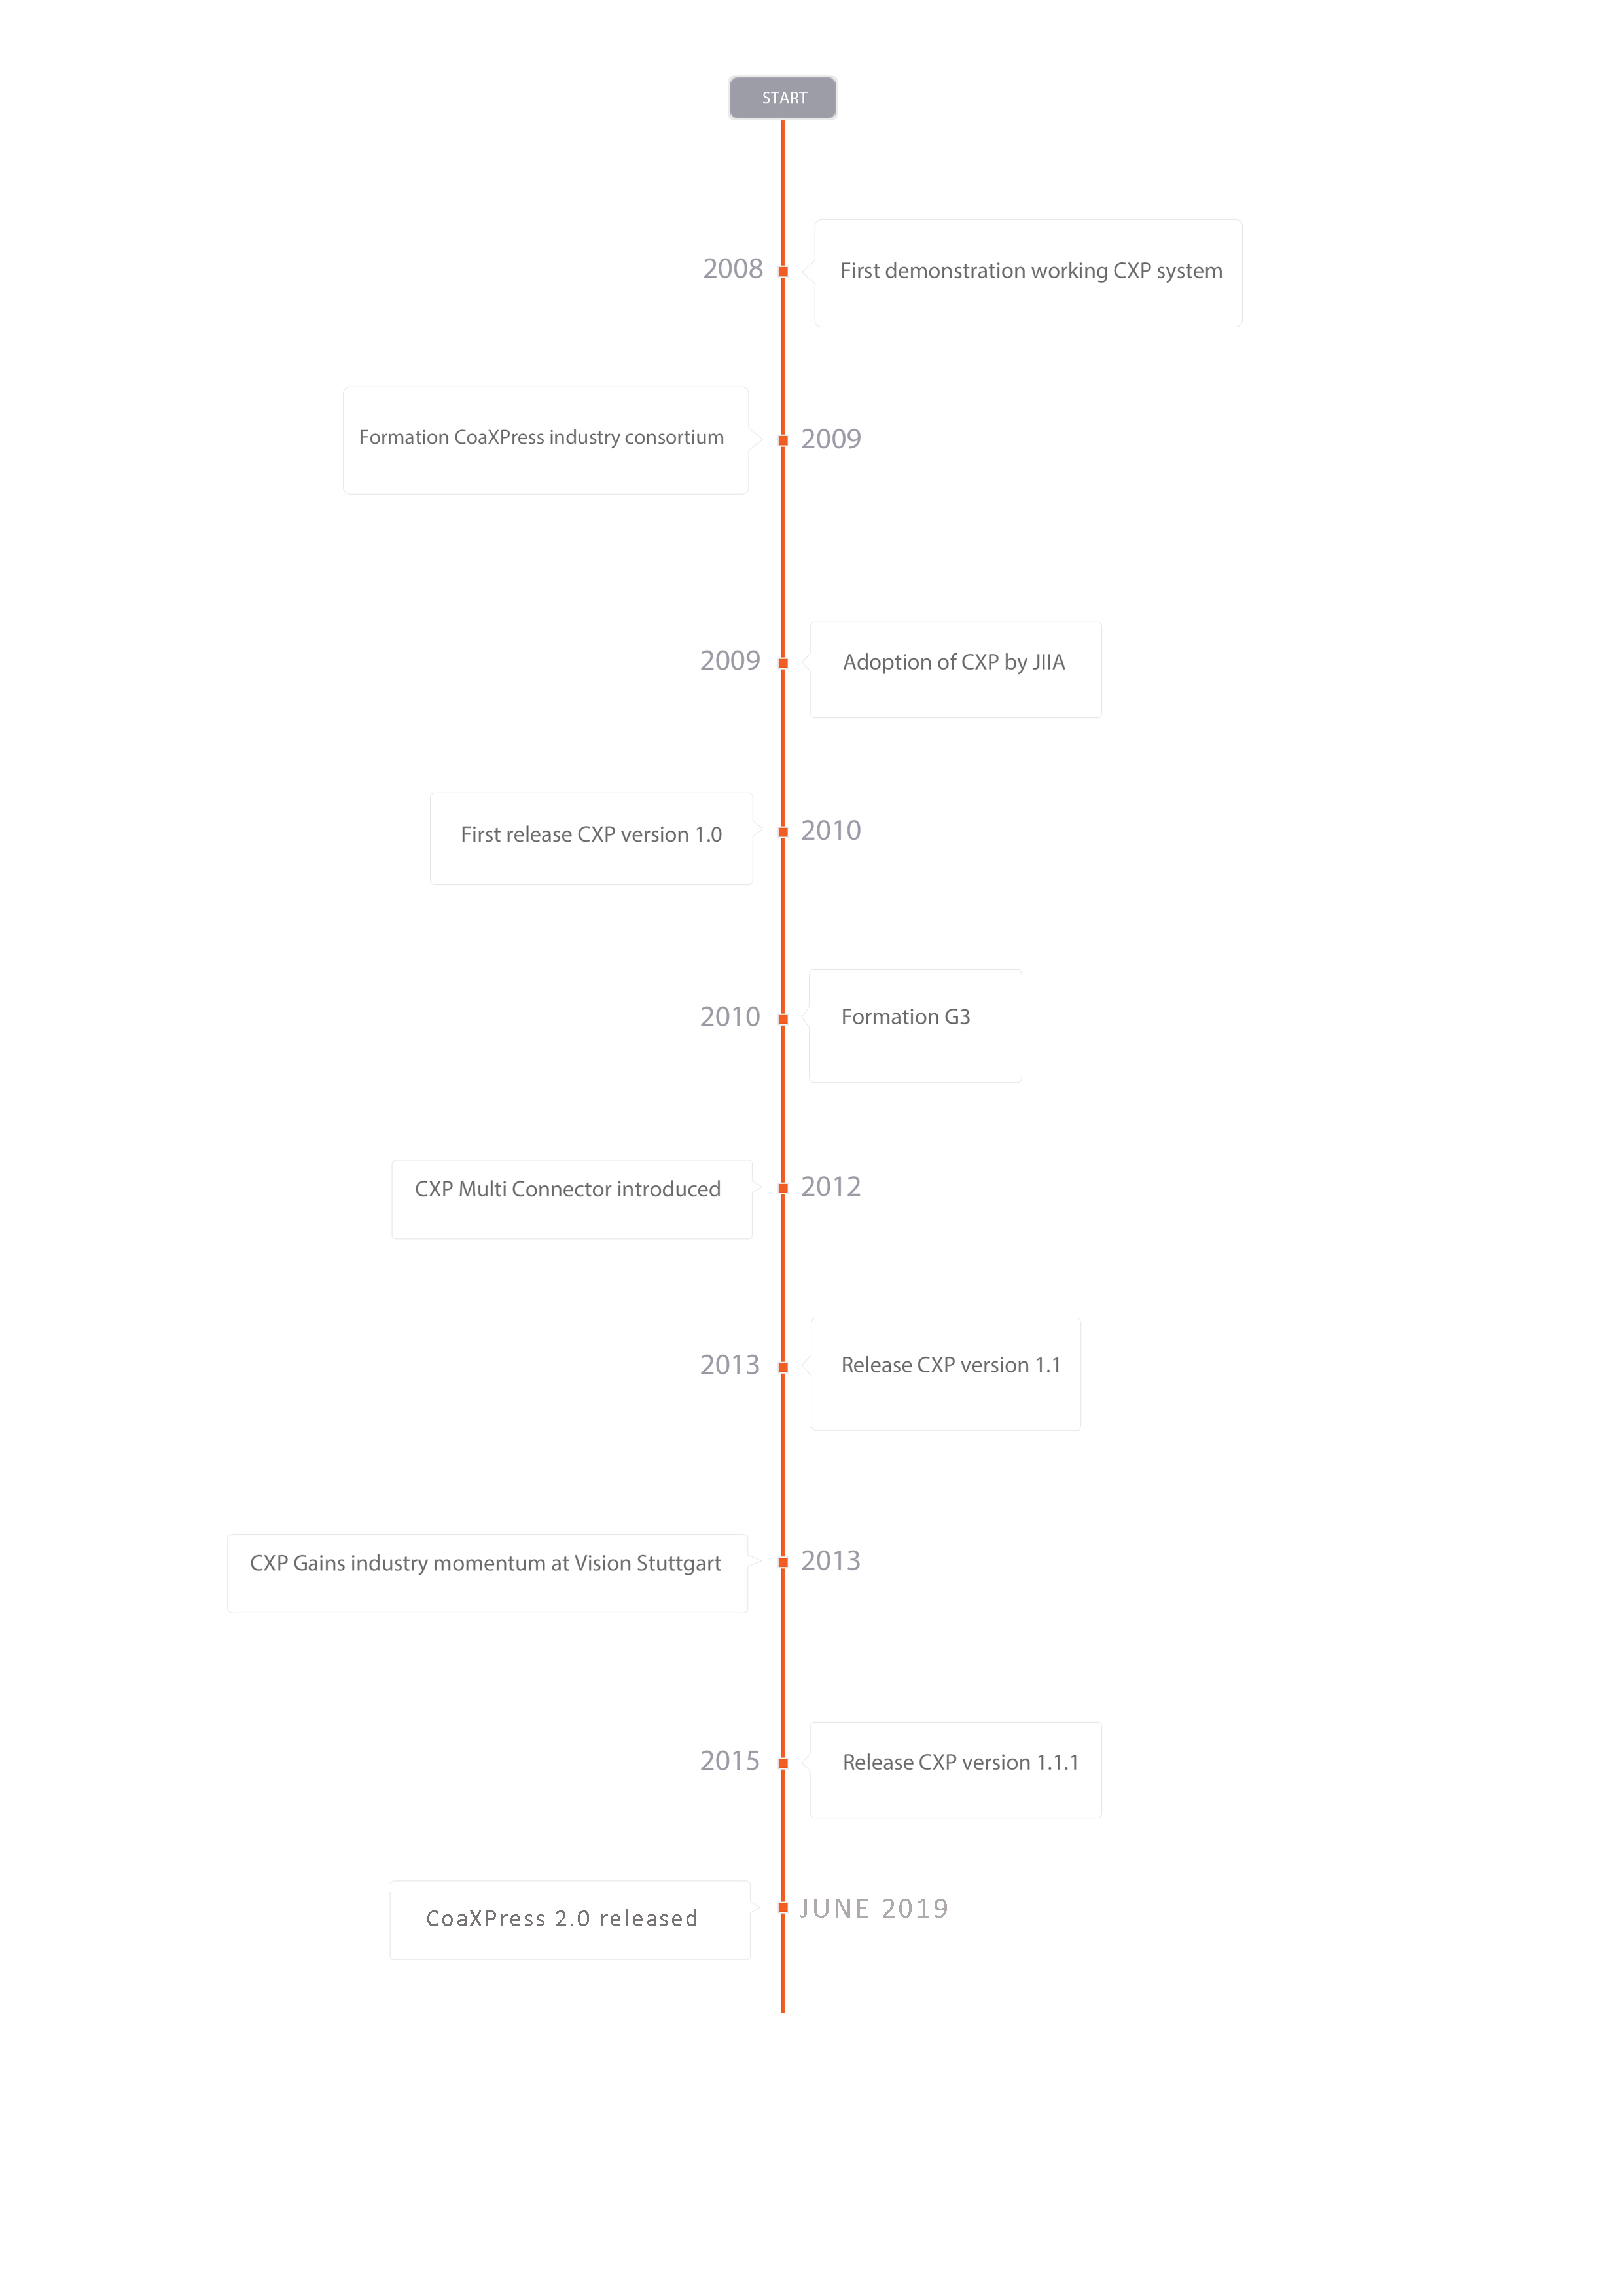 CoaXPress timeline